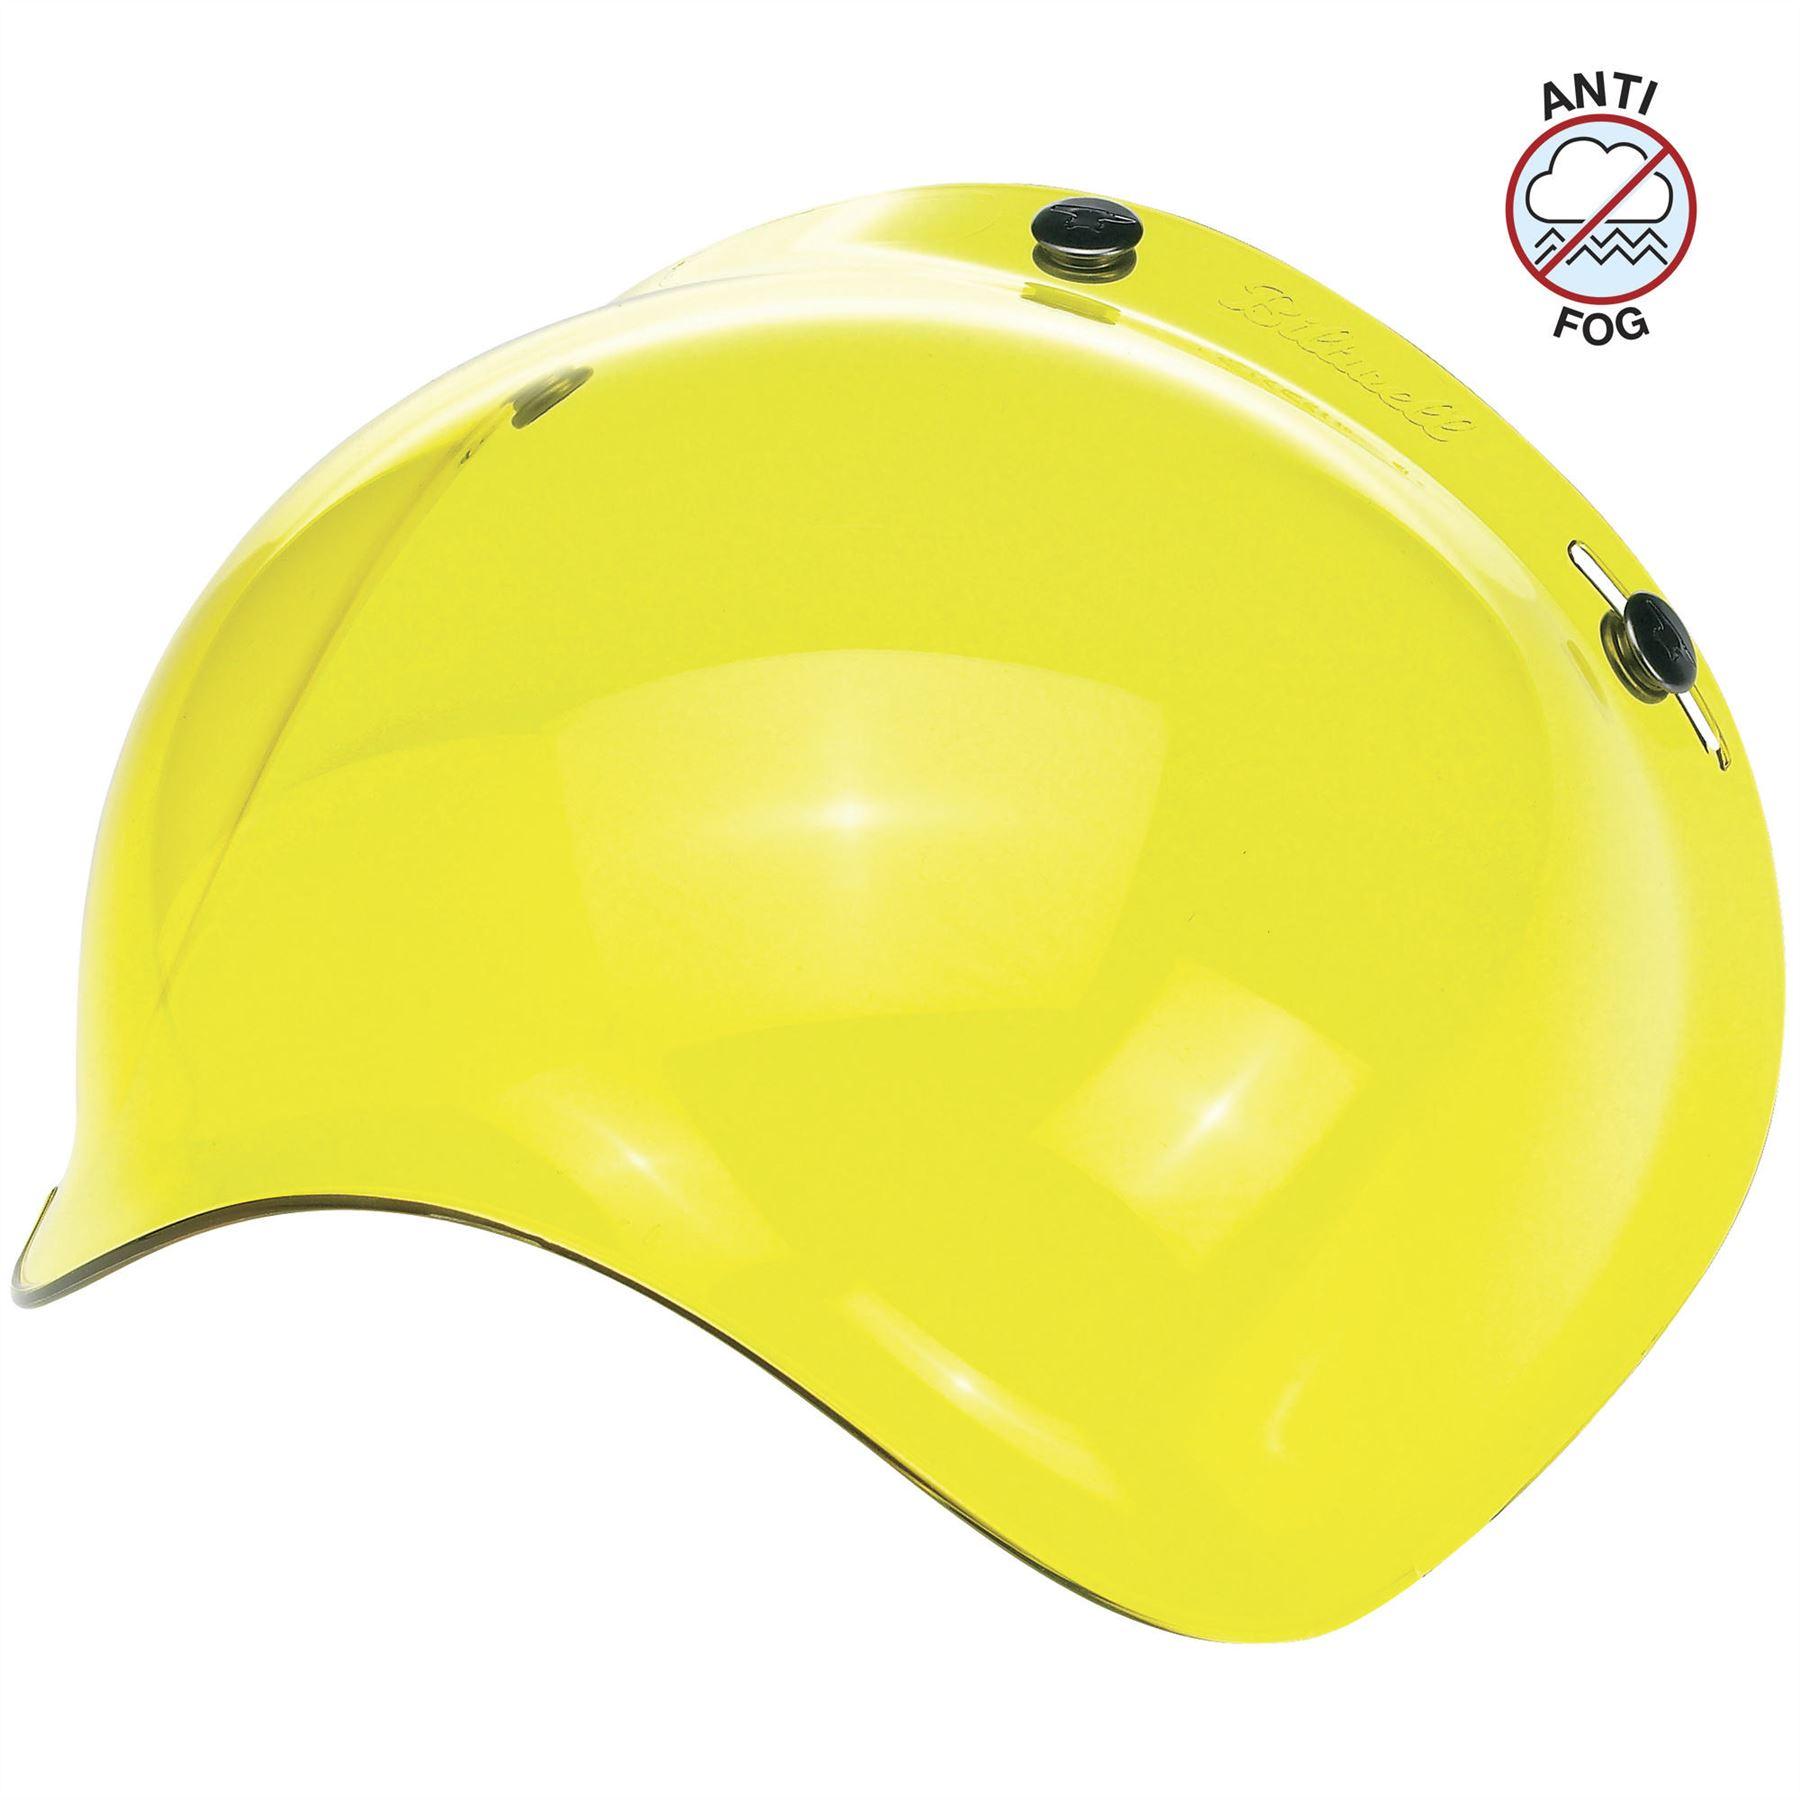 Biltwell Gringo S Bubble Shield Anti Fog Yellow